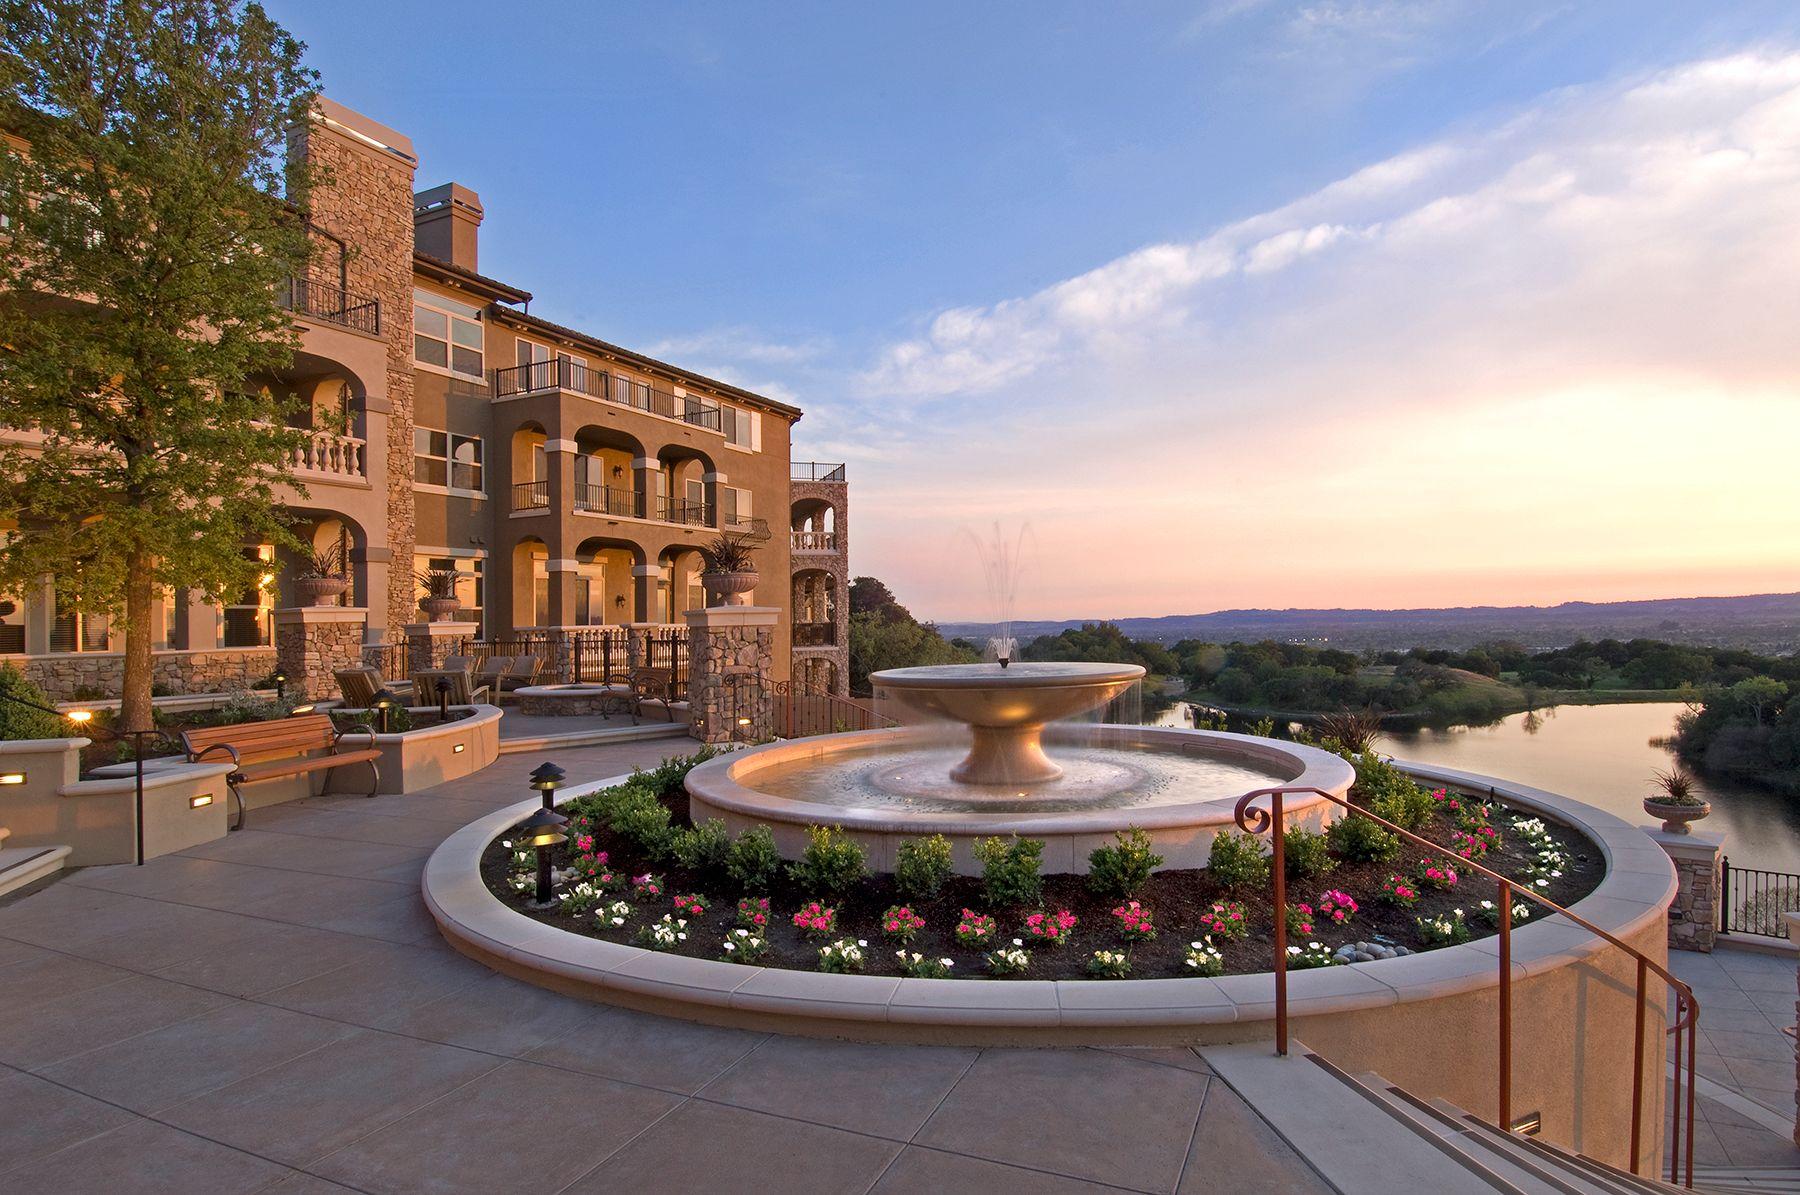 Varenna Sunset with fountain.jpg